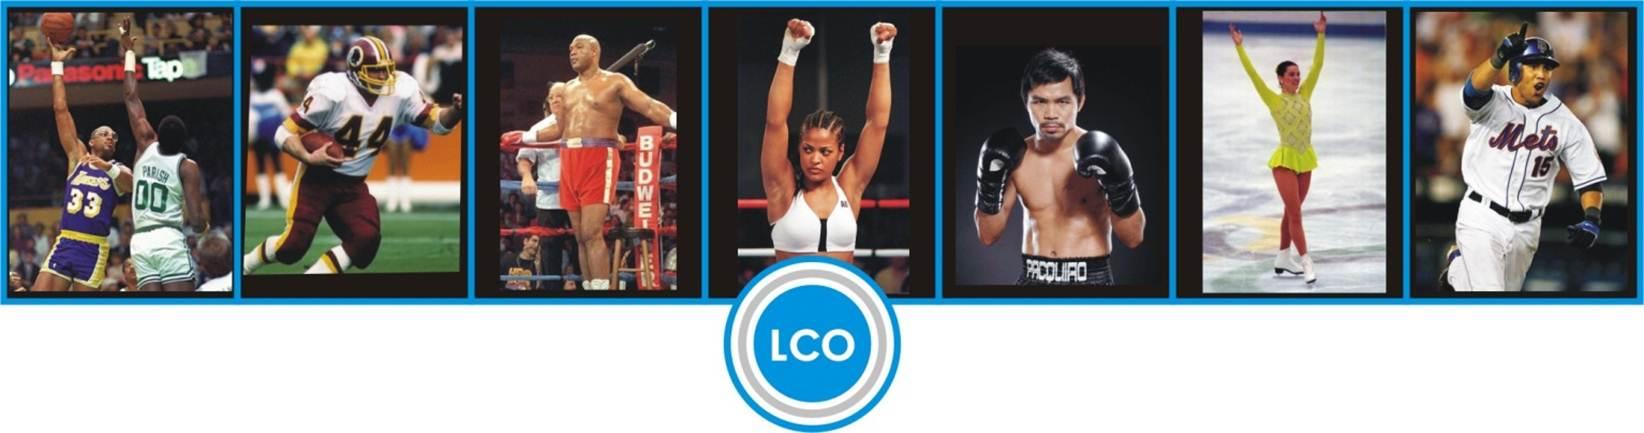 Iconic Sports PR - LCO